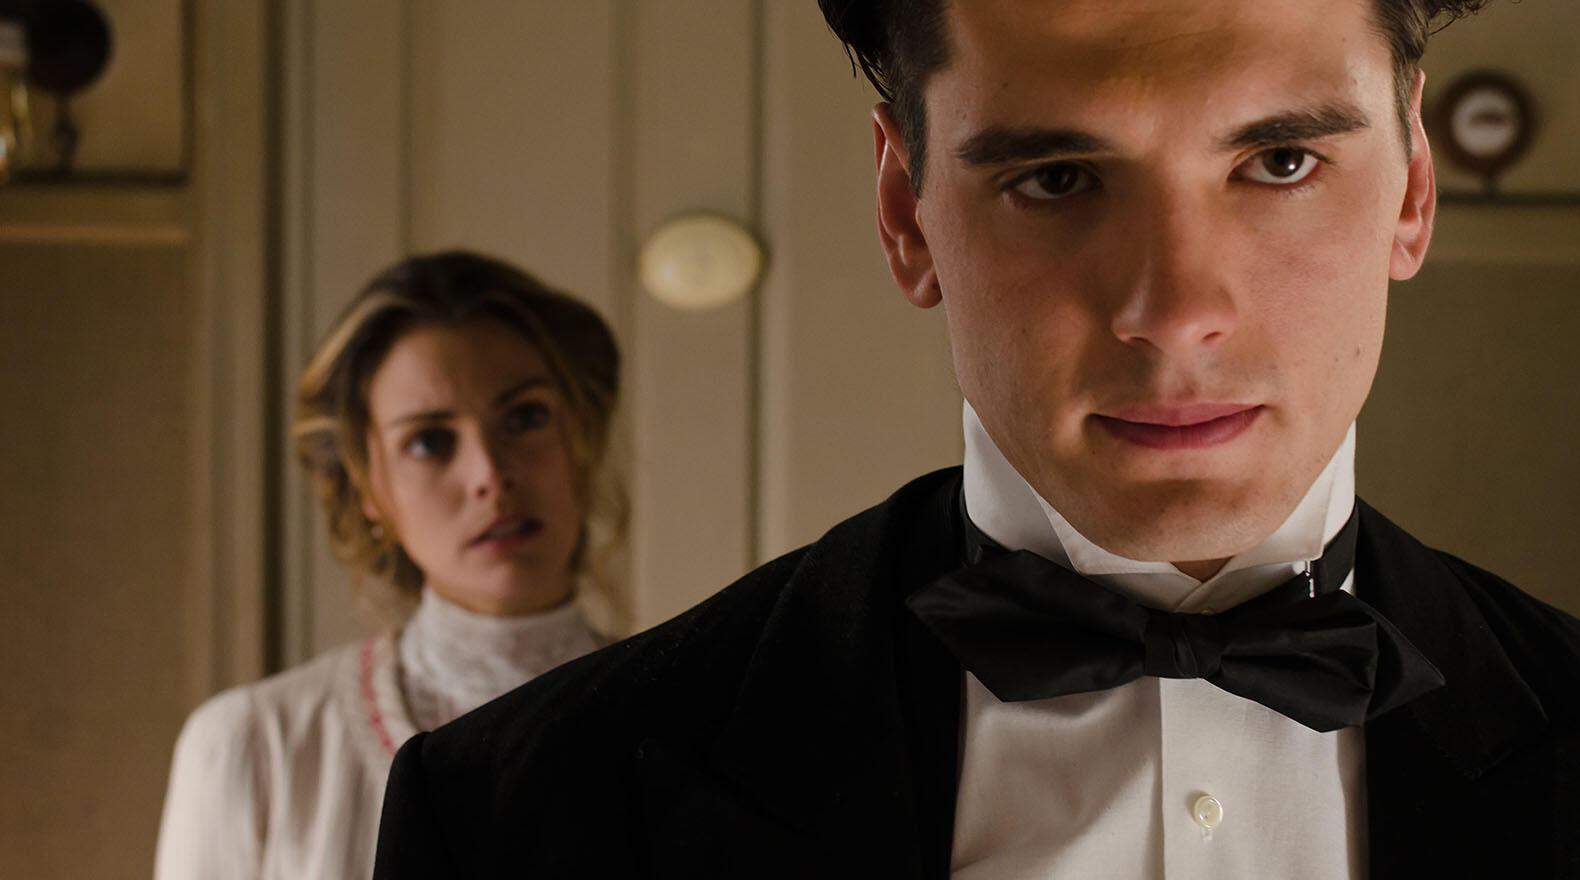 Grand Hotel Serie Staffel 2